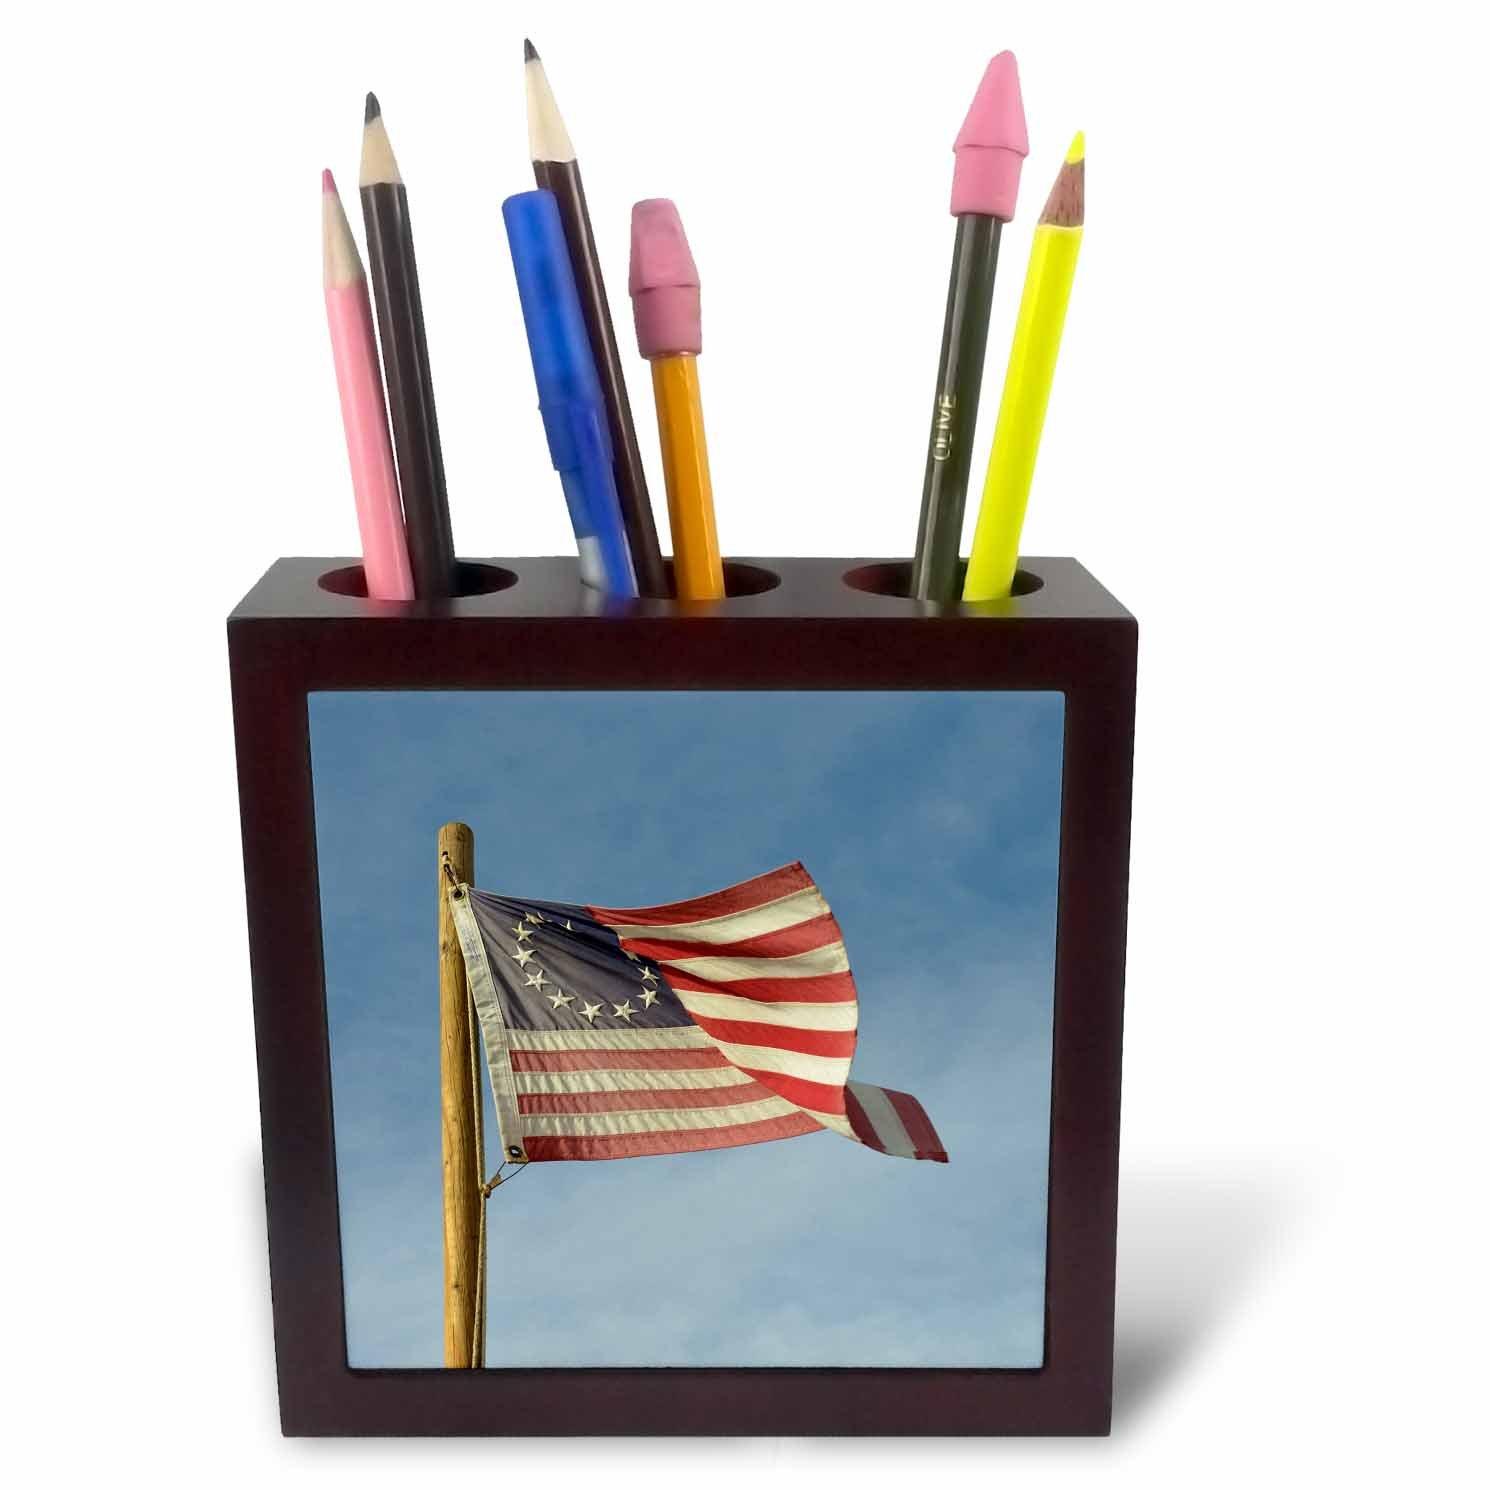 3dRose Danita Delimont - Flags - Arizona. Apache Junction, Betsy Ross US flag, Apacheland Movie Ranch - 5 inch tile pen holder (ph_278469_1)